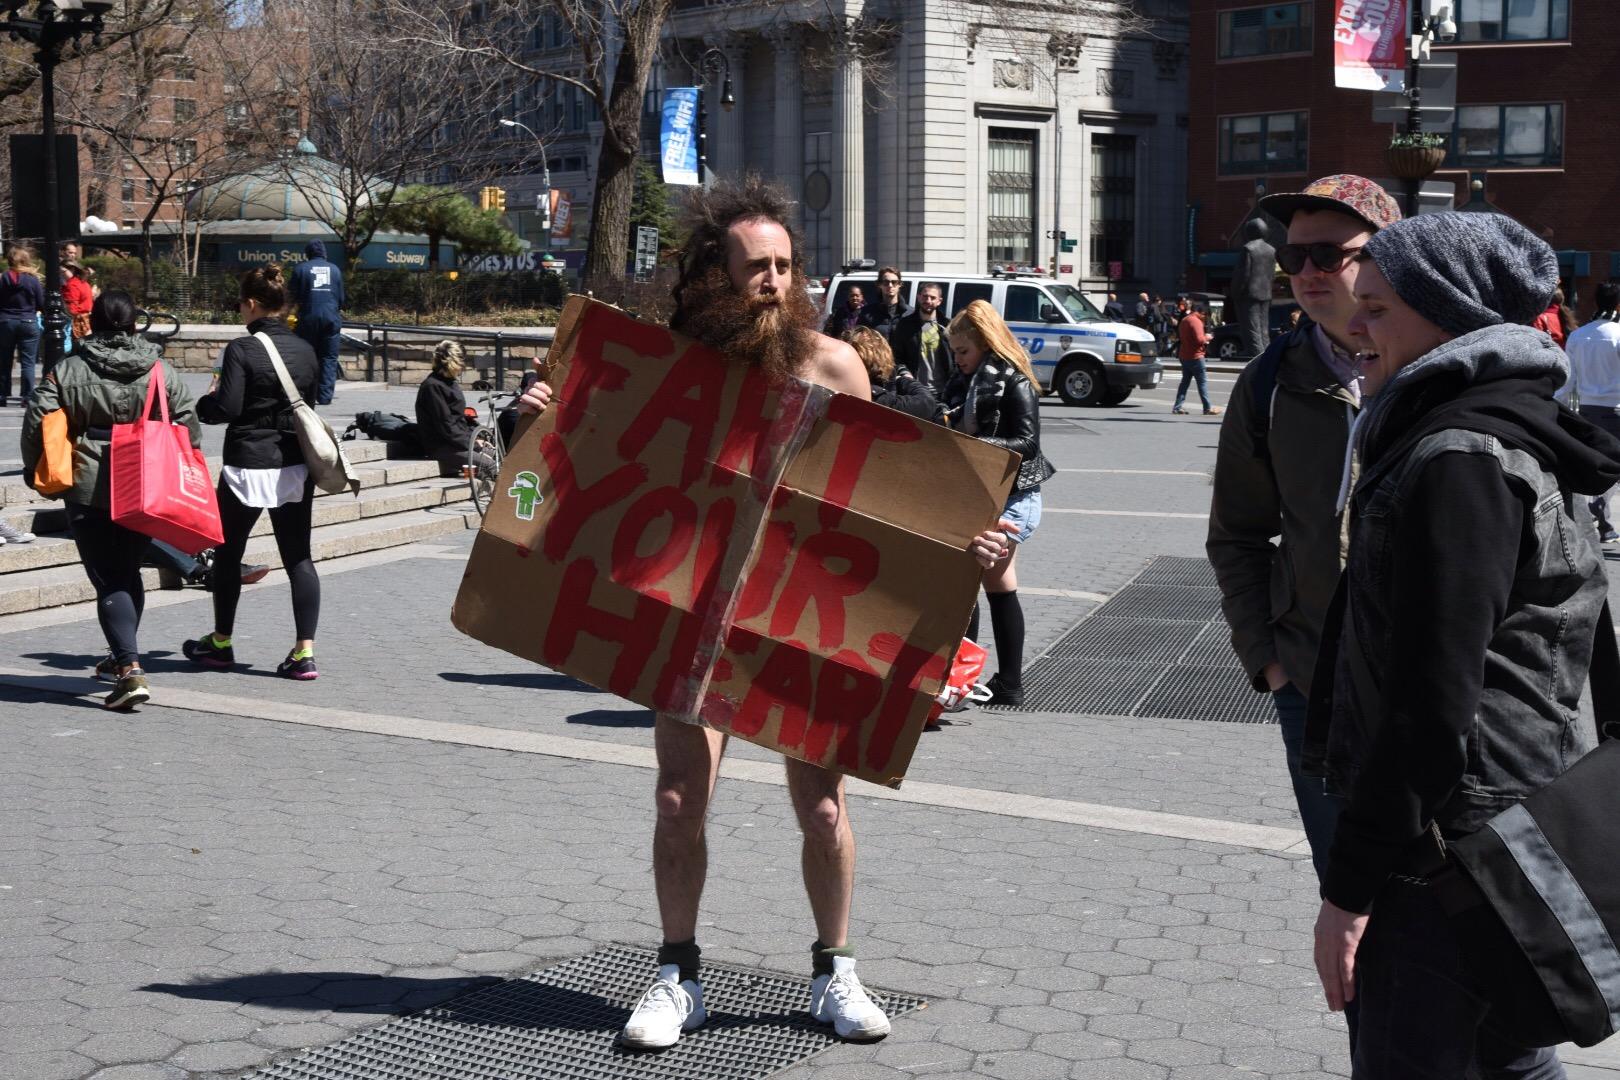 keine-parade-ohne-gegendemonstrant